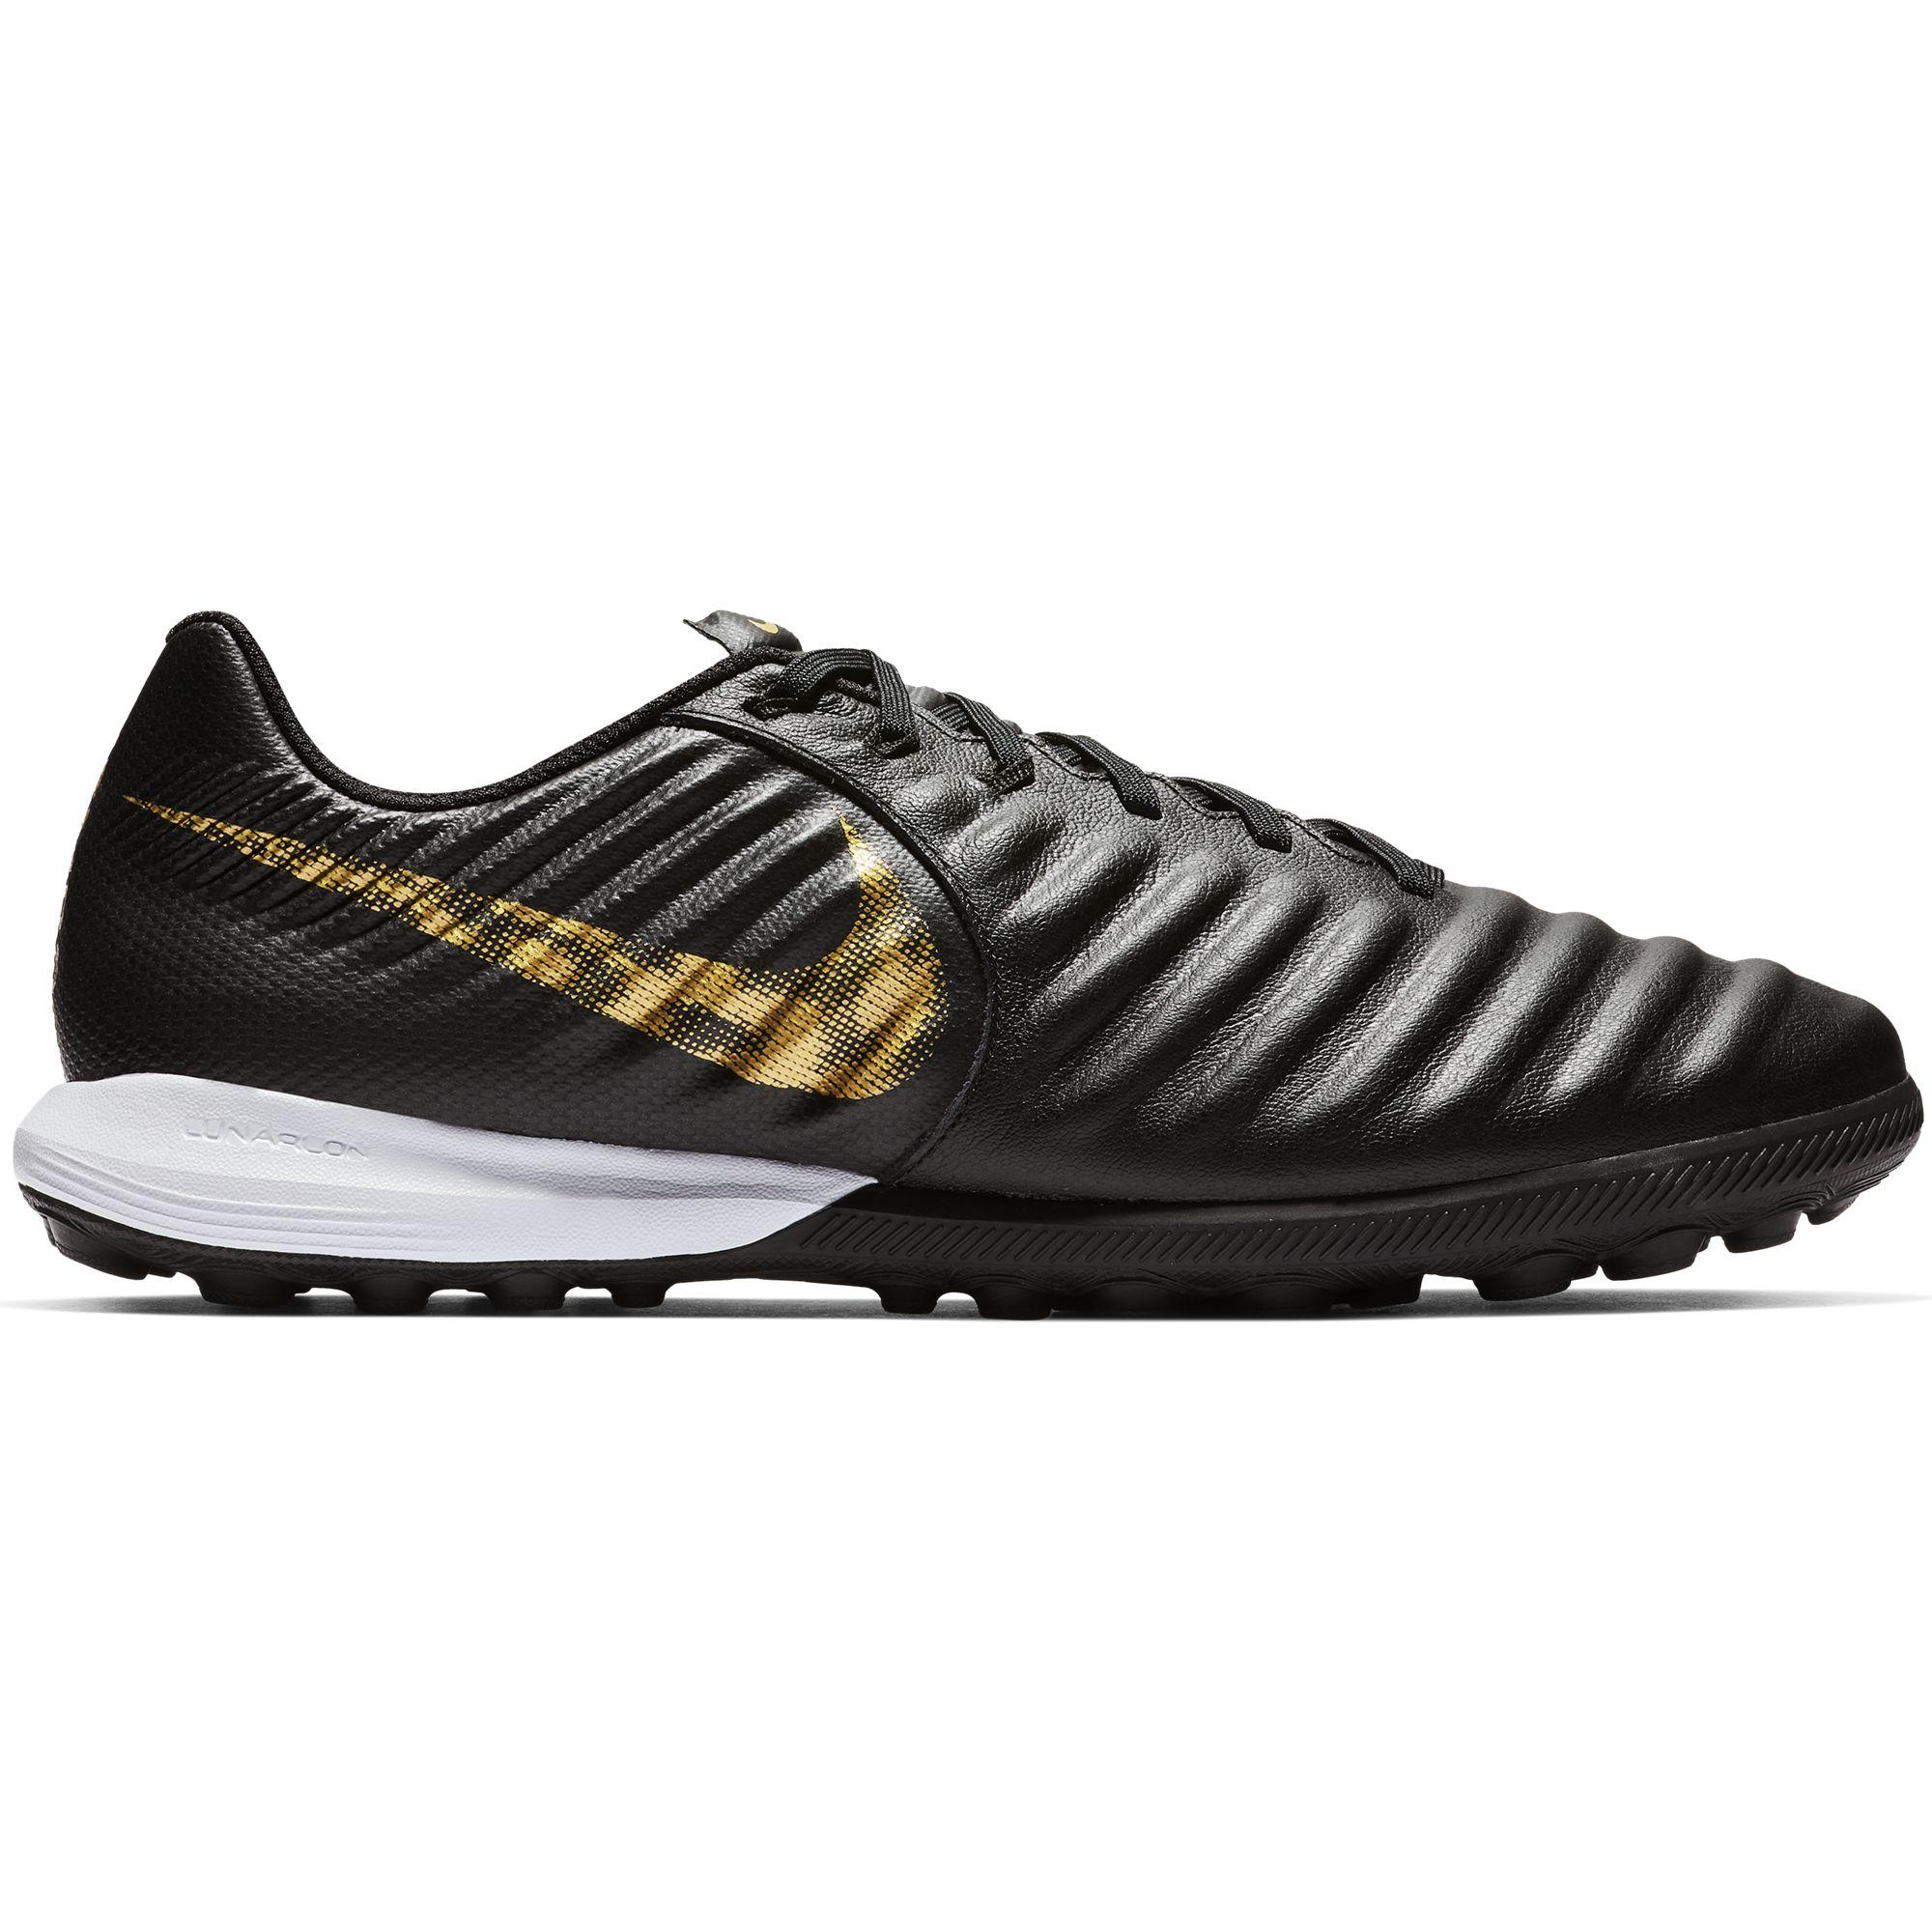 Nike Scarpe Calcetto Lunar Legendx 7 Pro Tf